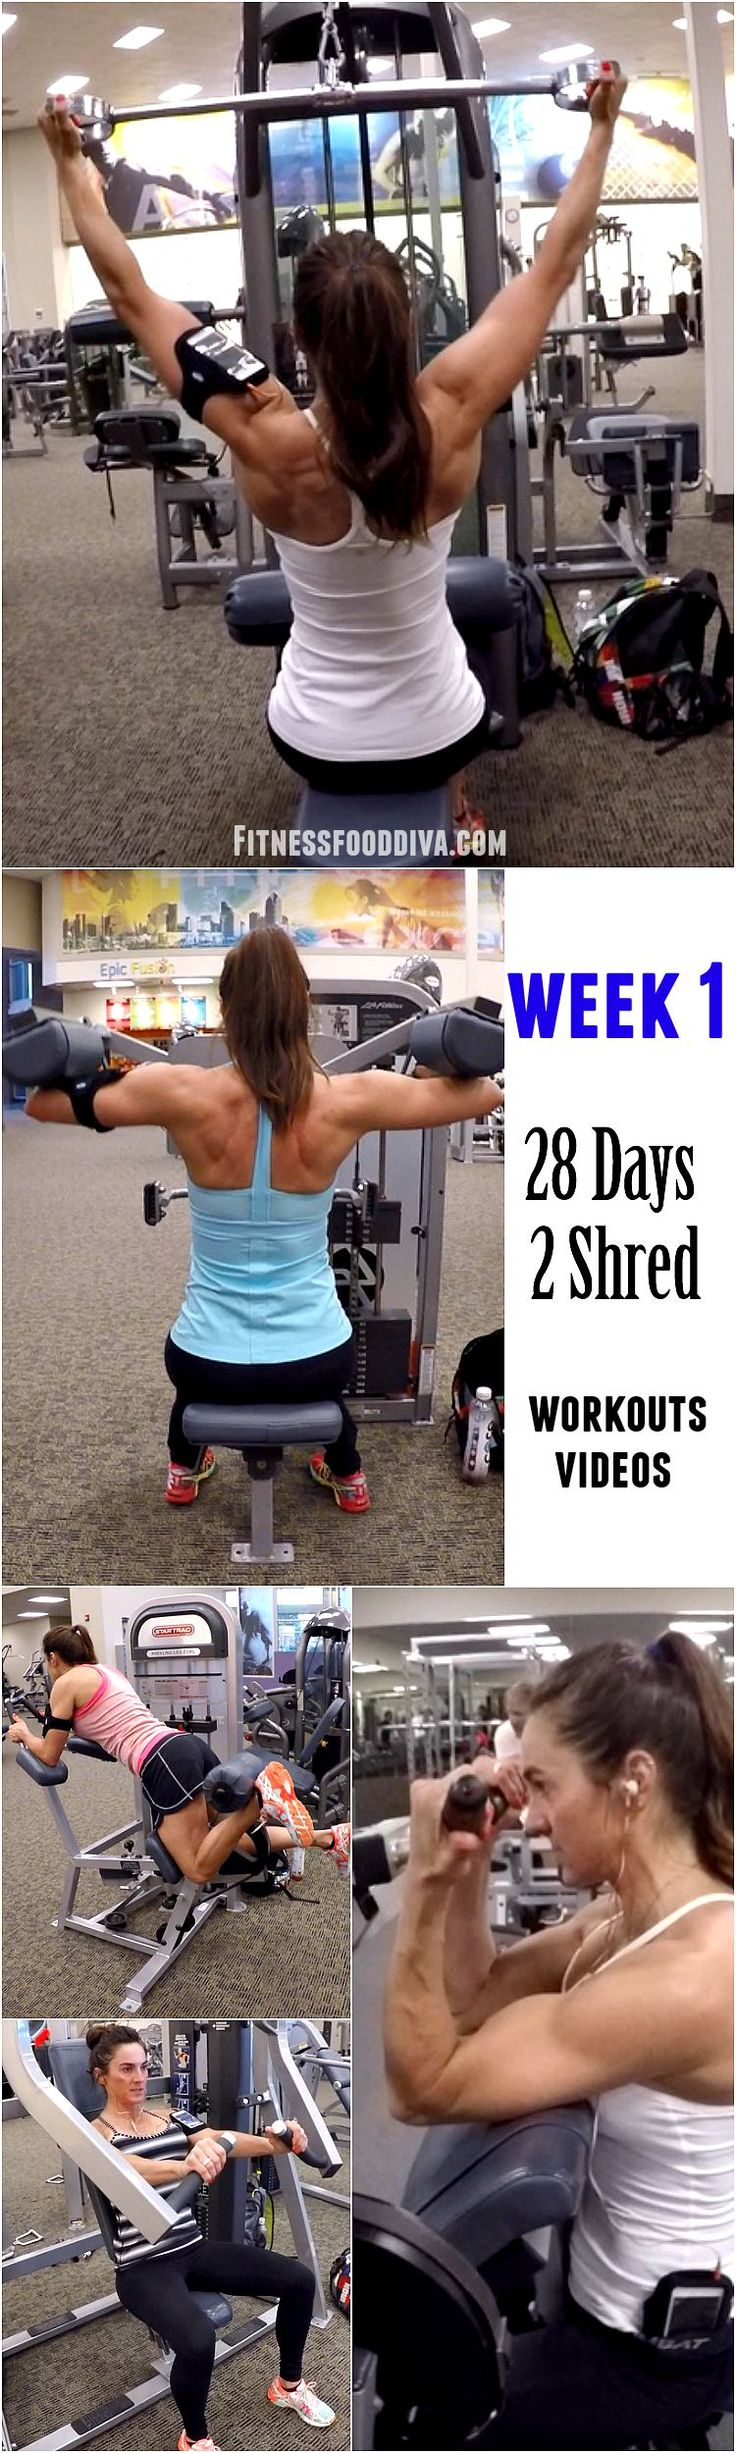 Week 1: 28 Days 2 Shred workout/videos